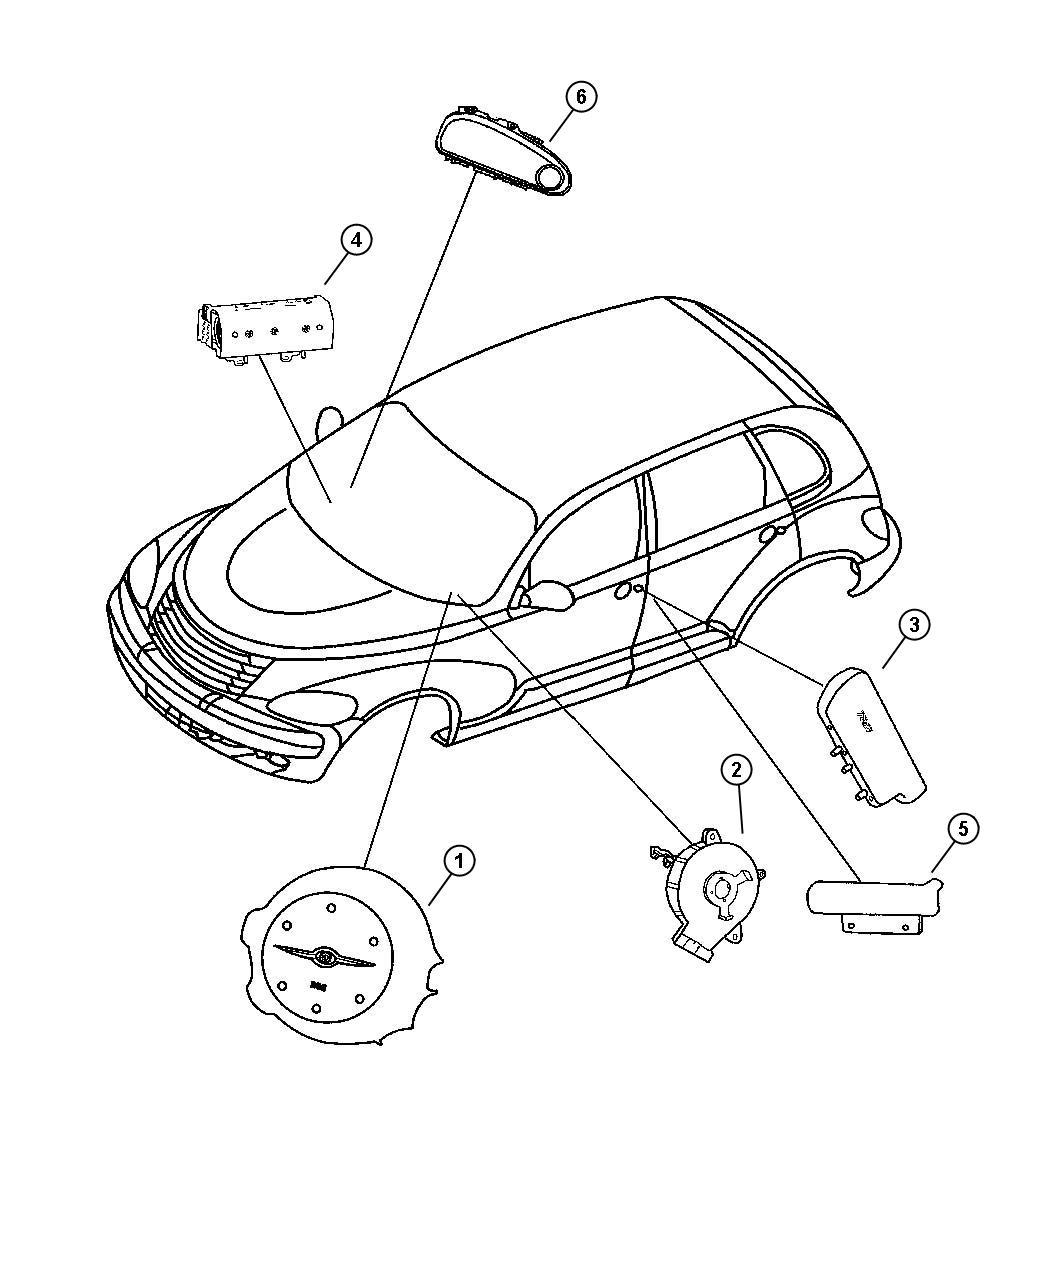 Dodge Ram Air Bag Driver Fl Trim All Trim Codes Color Taupe Pearl Beige